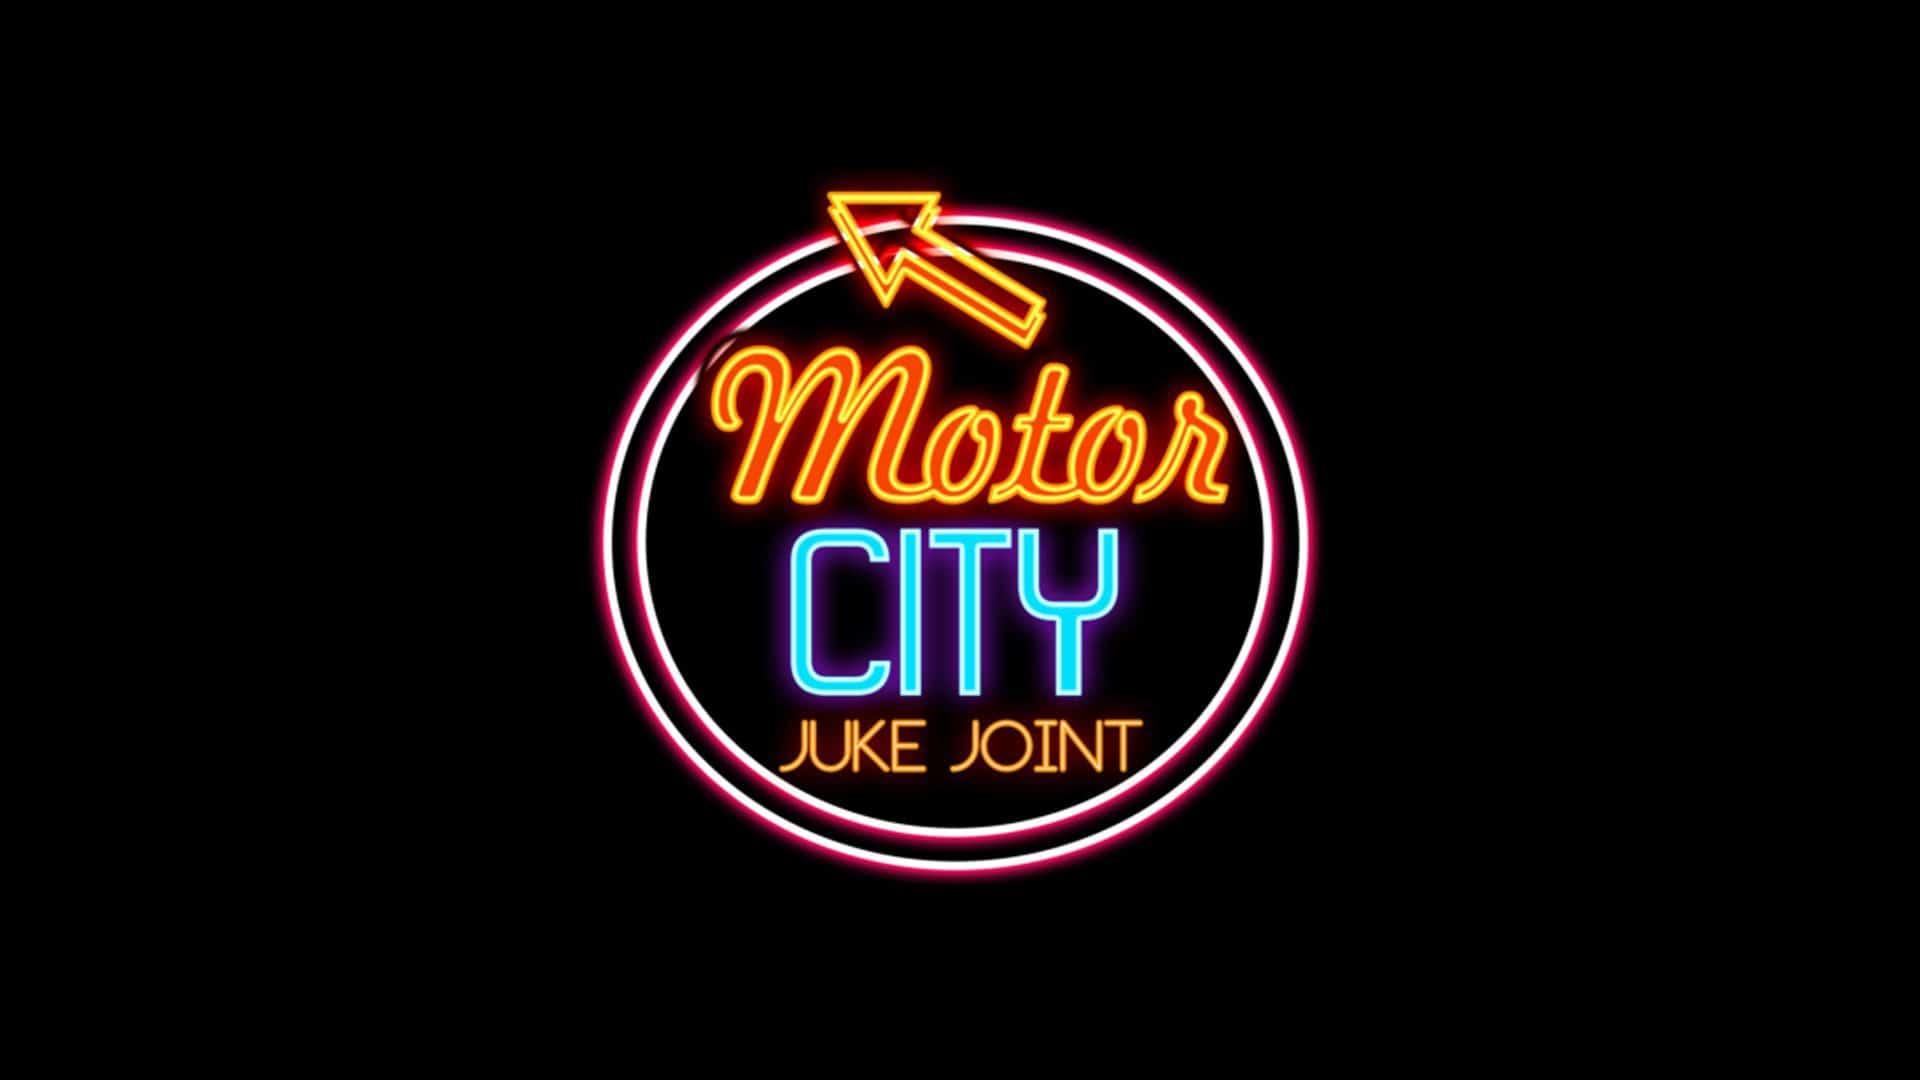 Motor City Juke Joint Episode 235